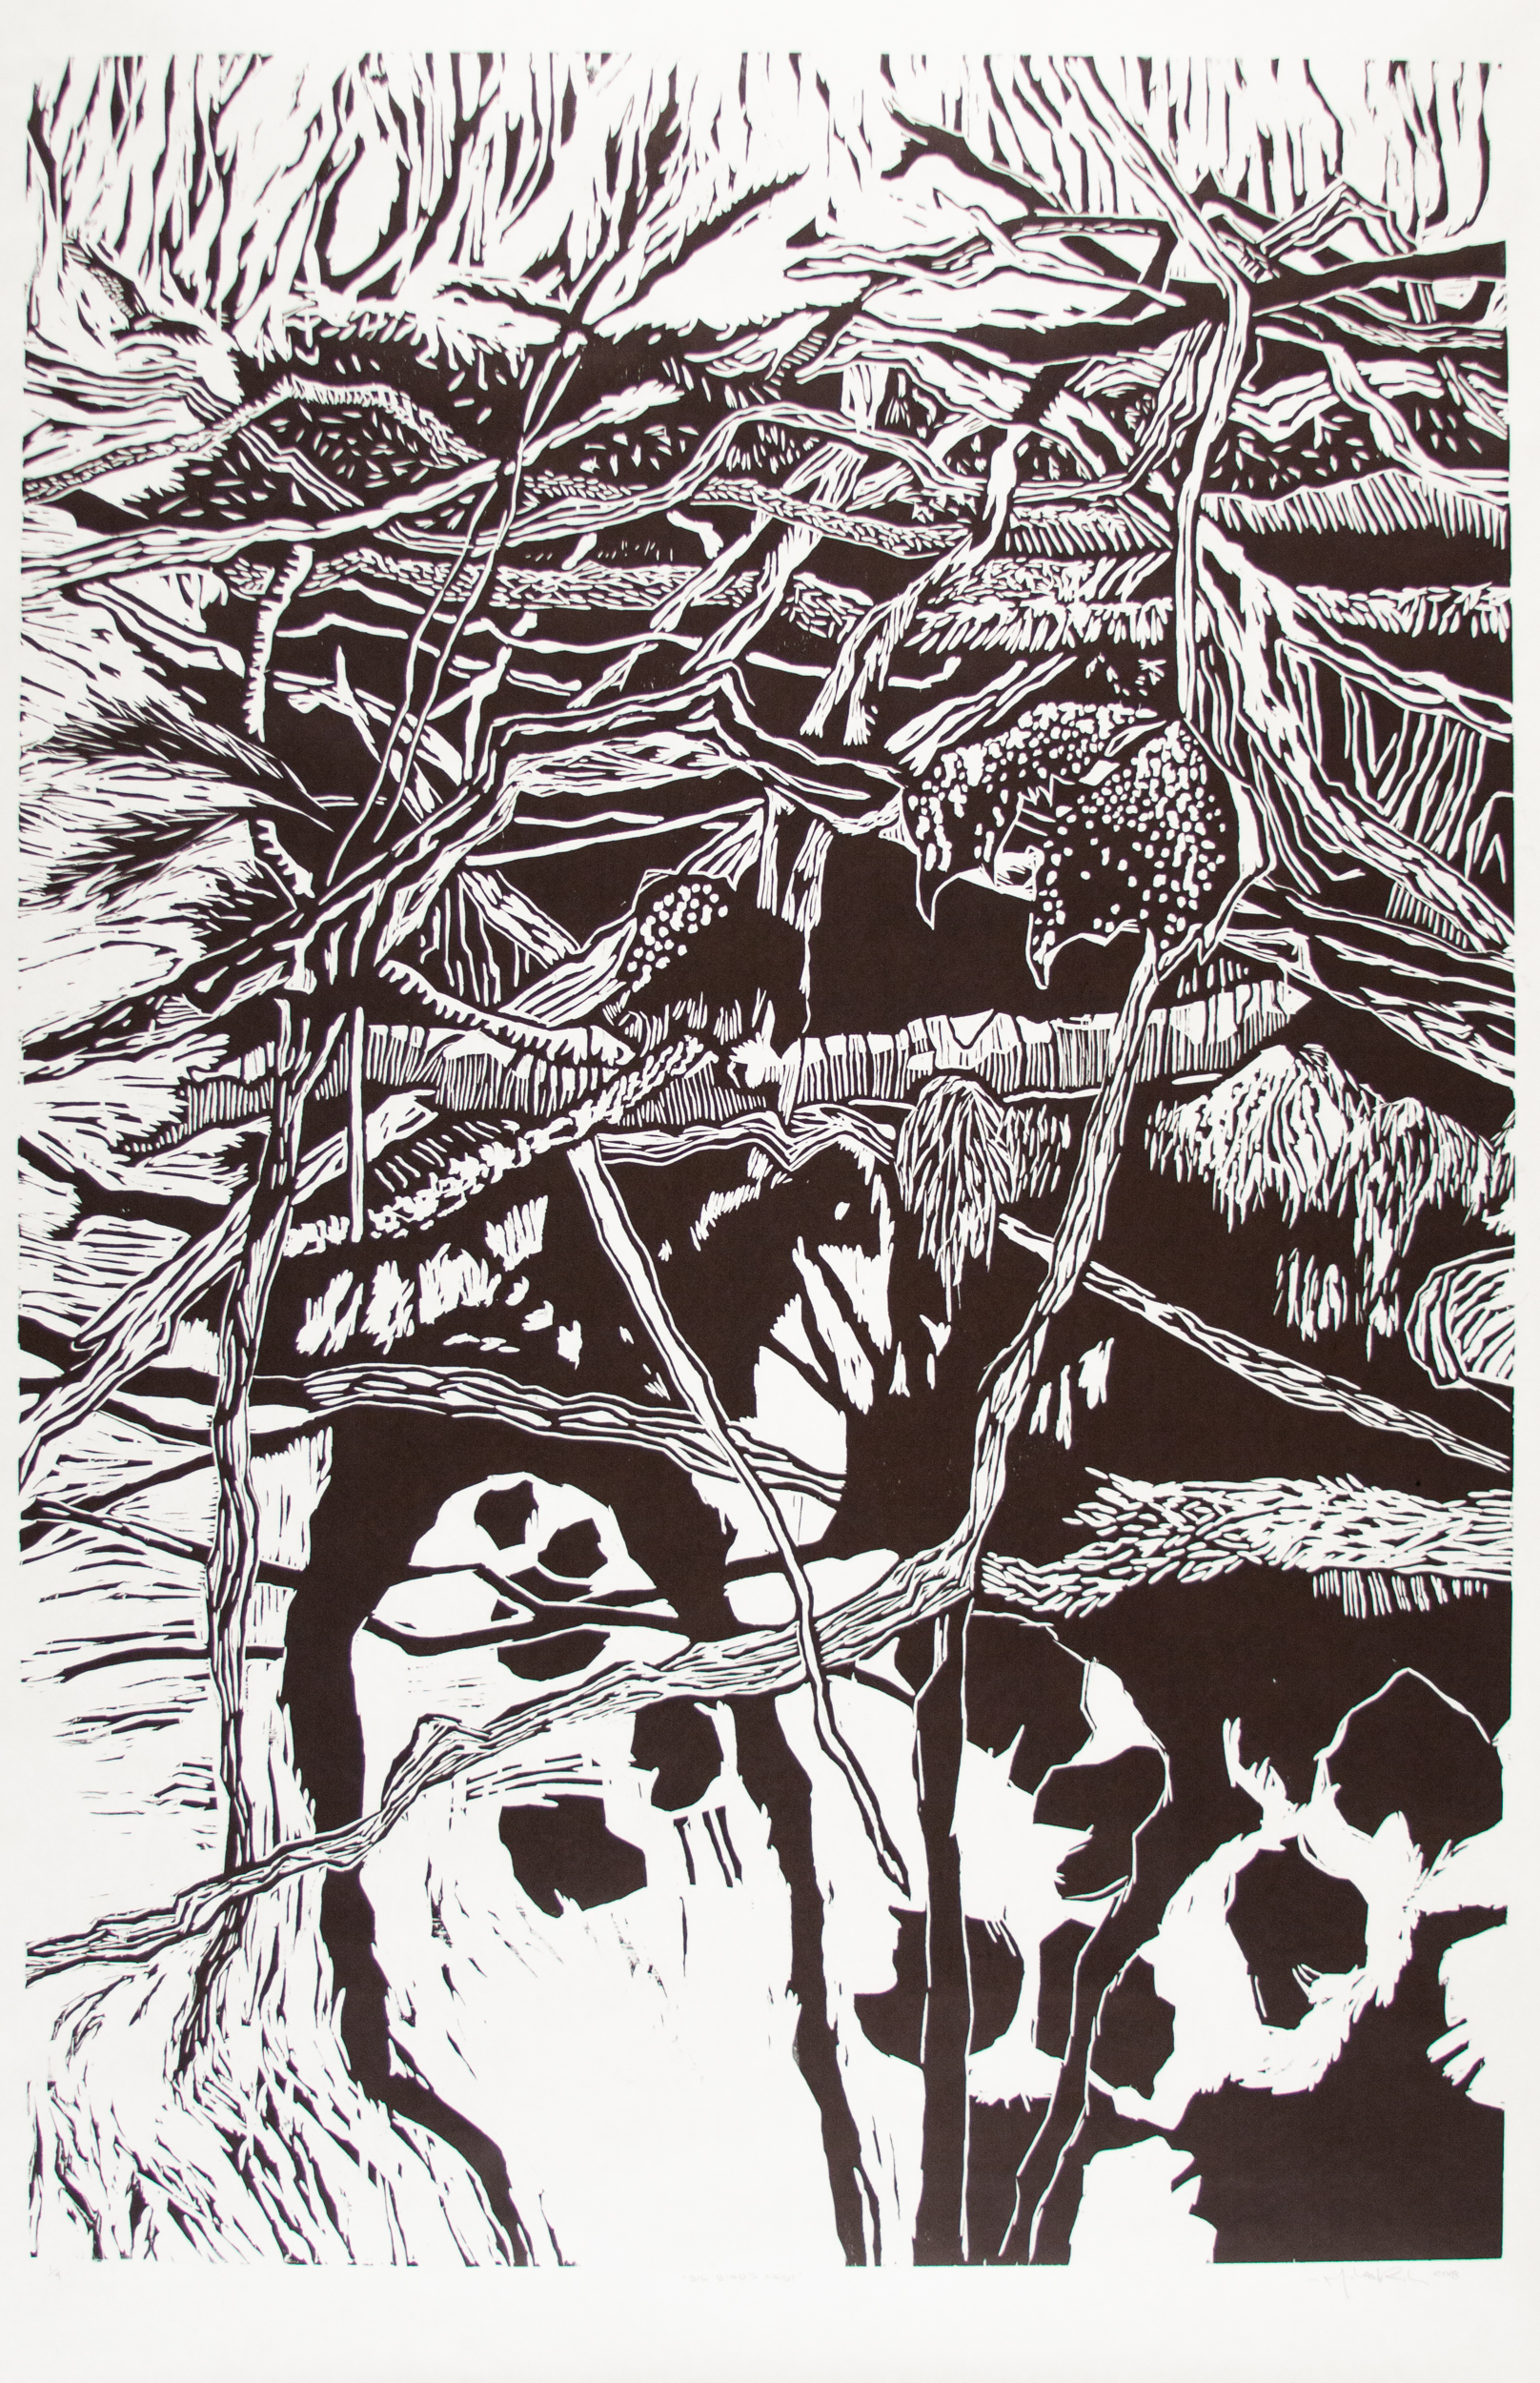 Michael Rich  Big Bird's Nest,  2018 woodcut print 72 x 36 in. edition of 4